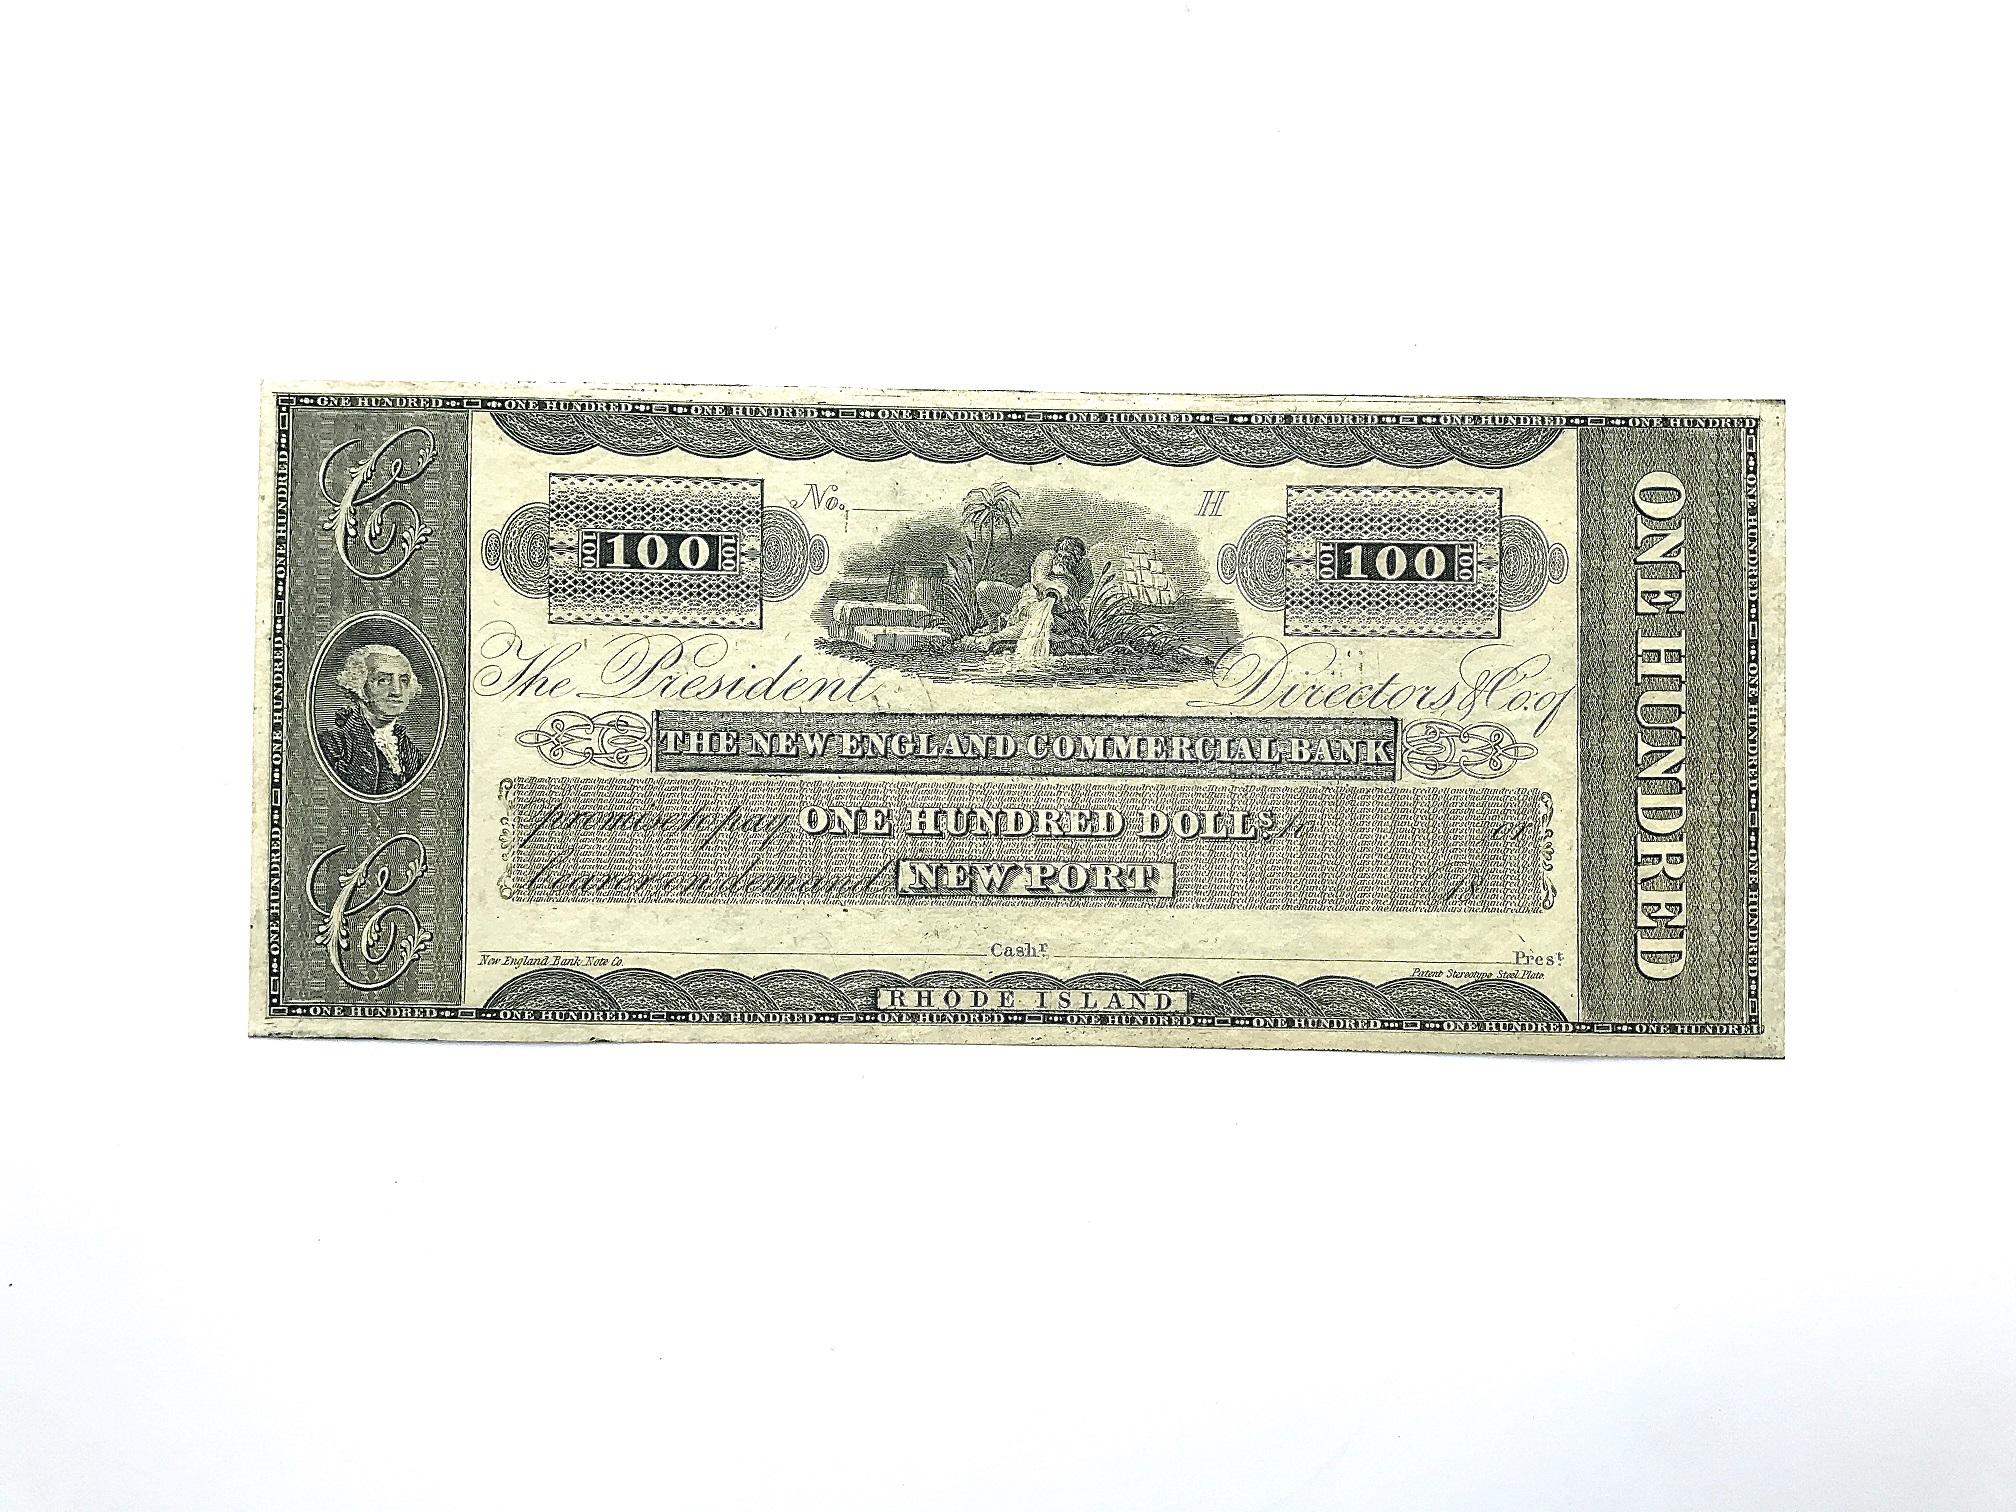 $ 100 bill, 1863, USA | Hobby Keeper Articles